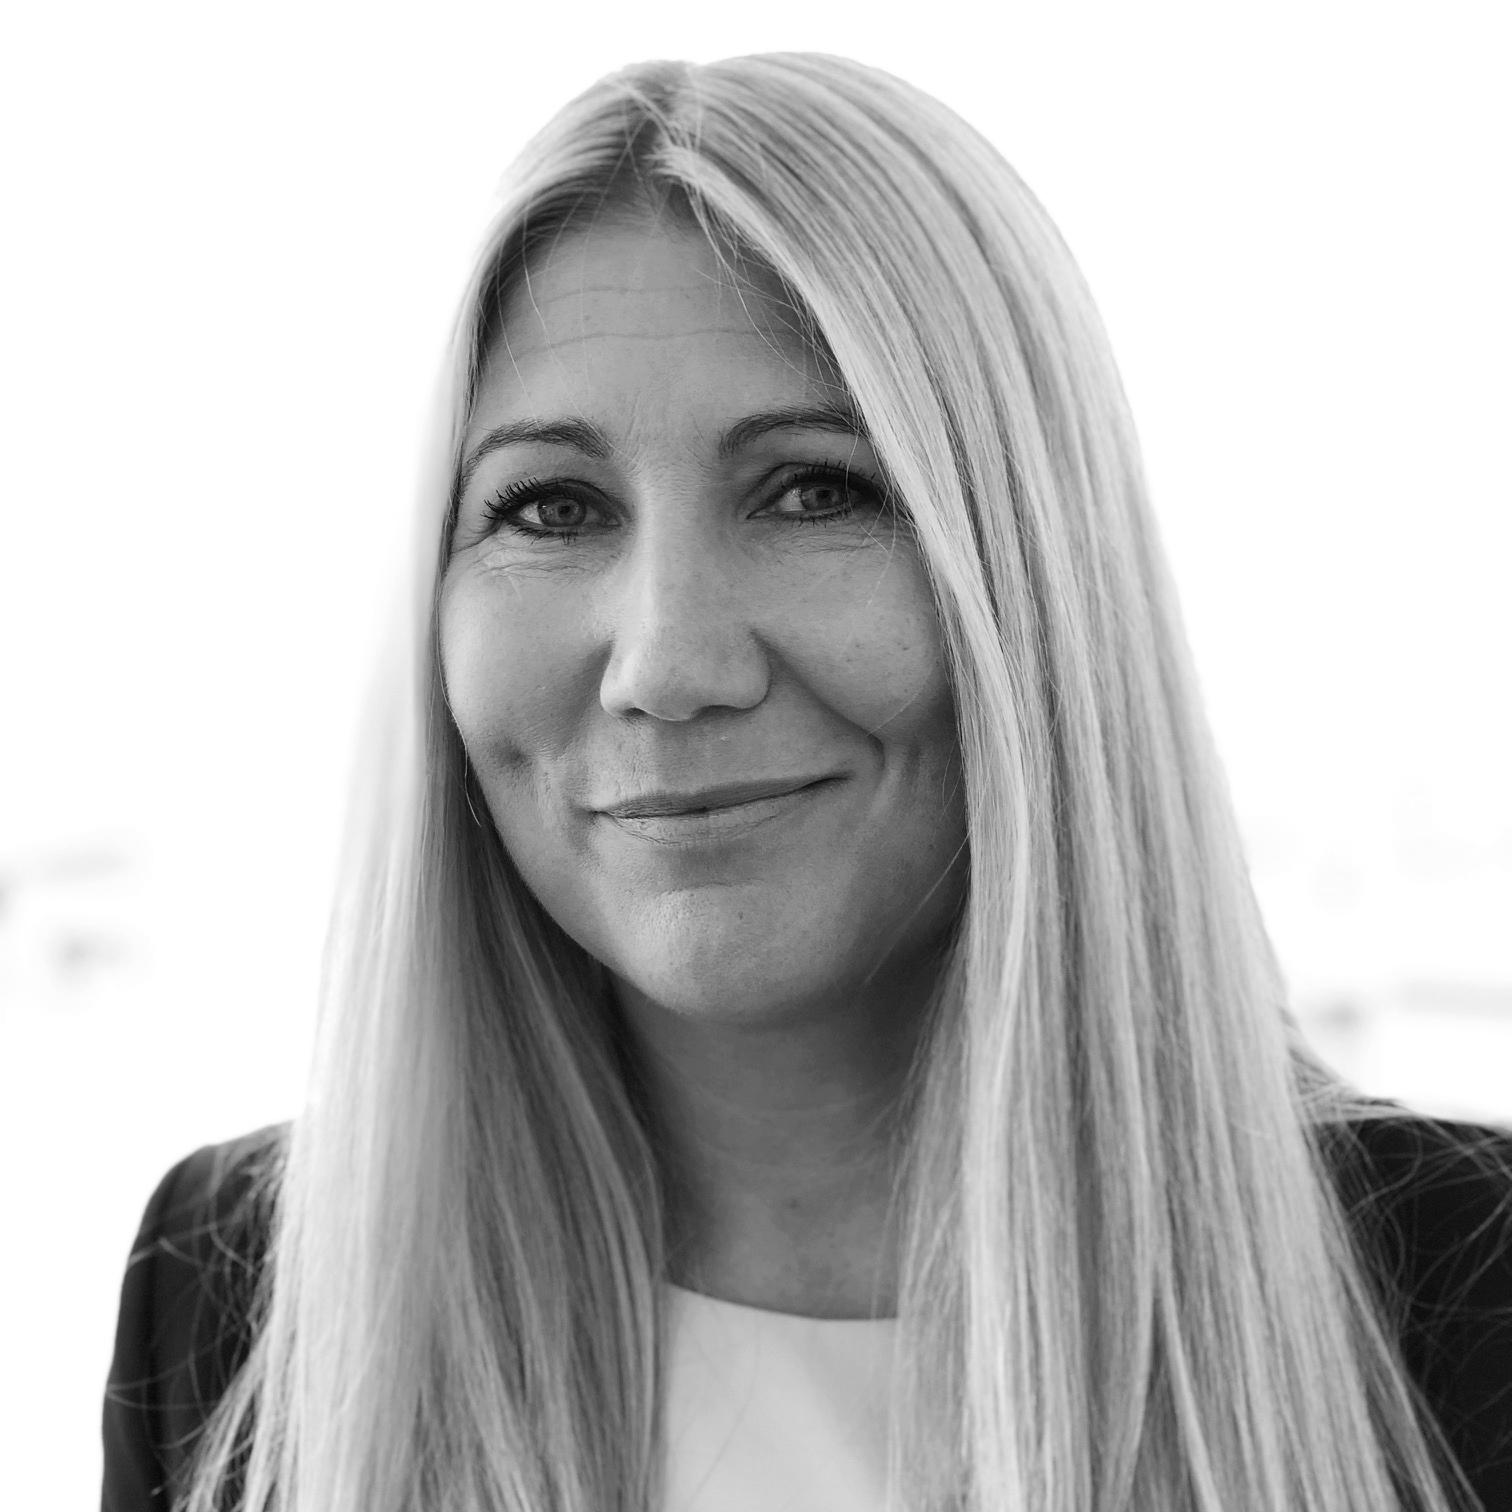 Karoline Hammer-Larsen   General Manager Epost:karoline.hammer.larsen@choice.no Mobil: +47 948 08 022